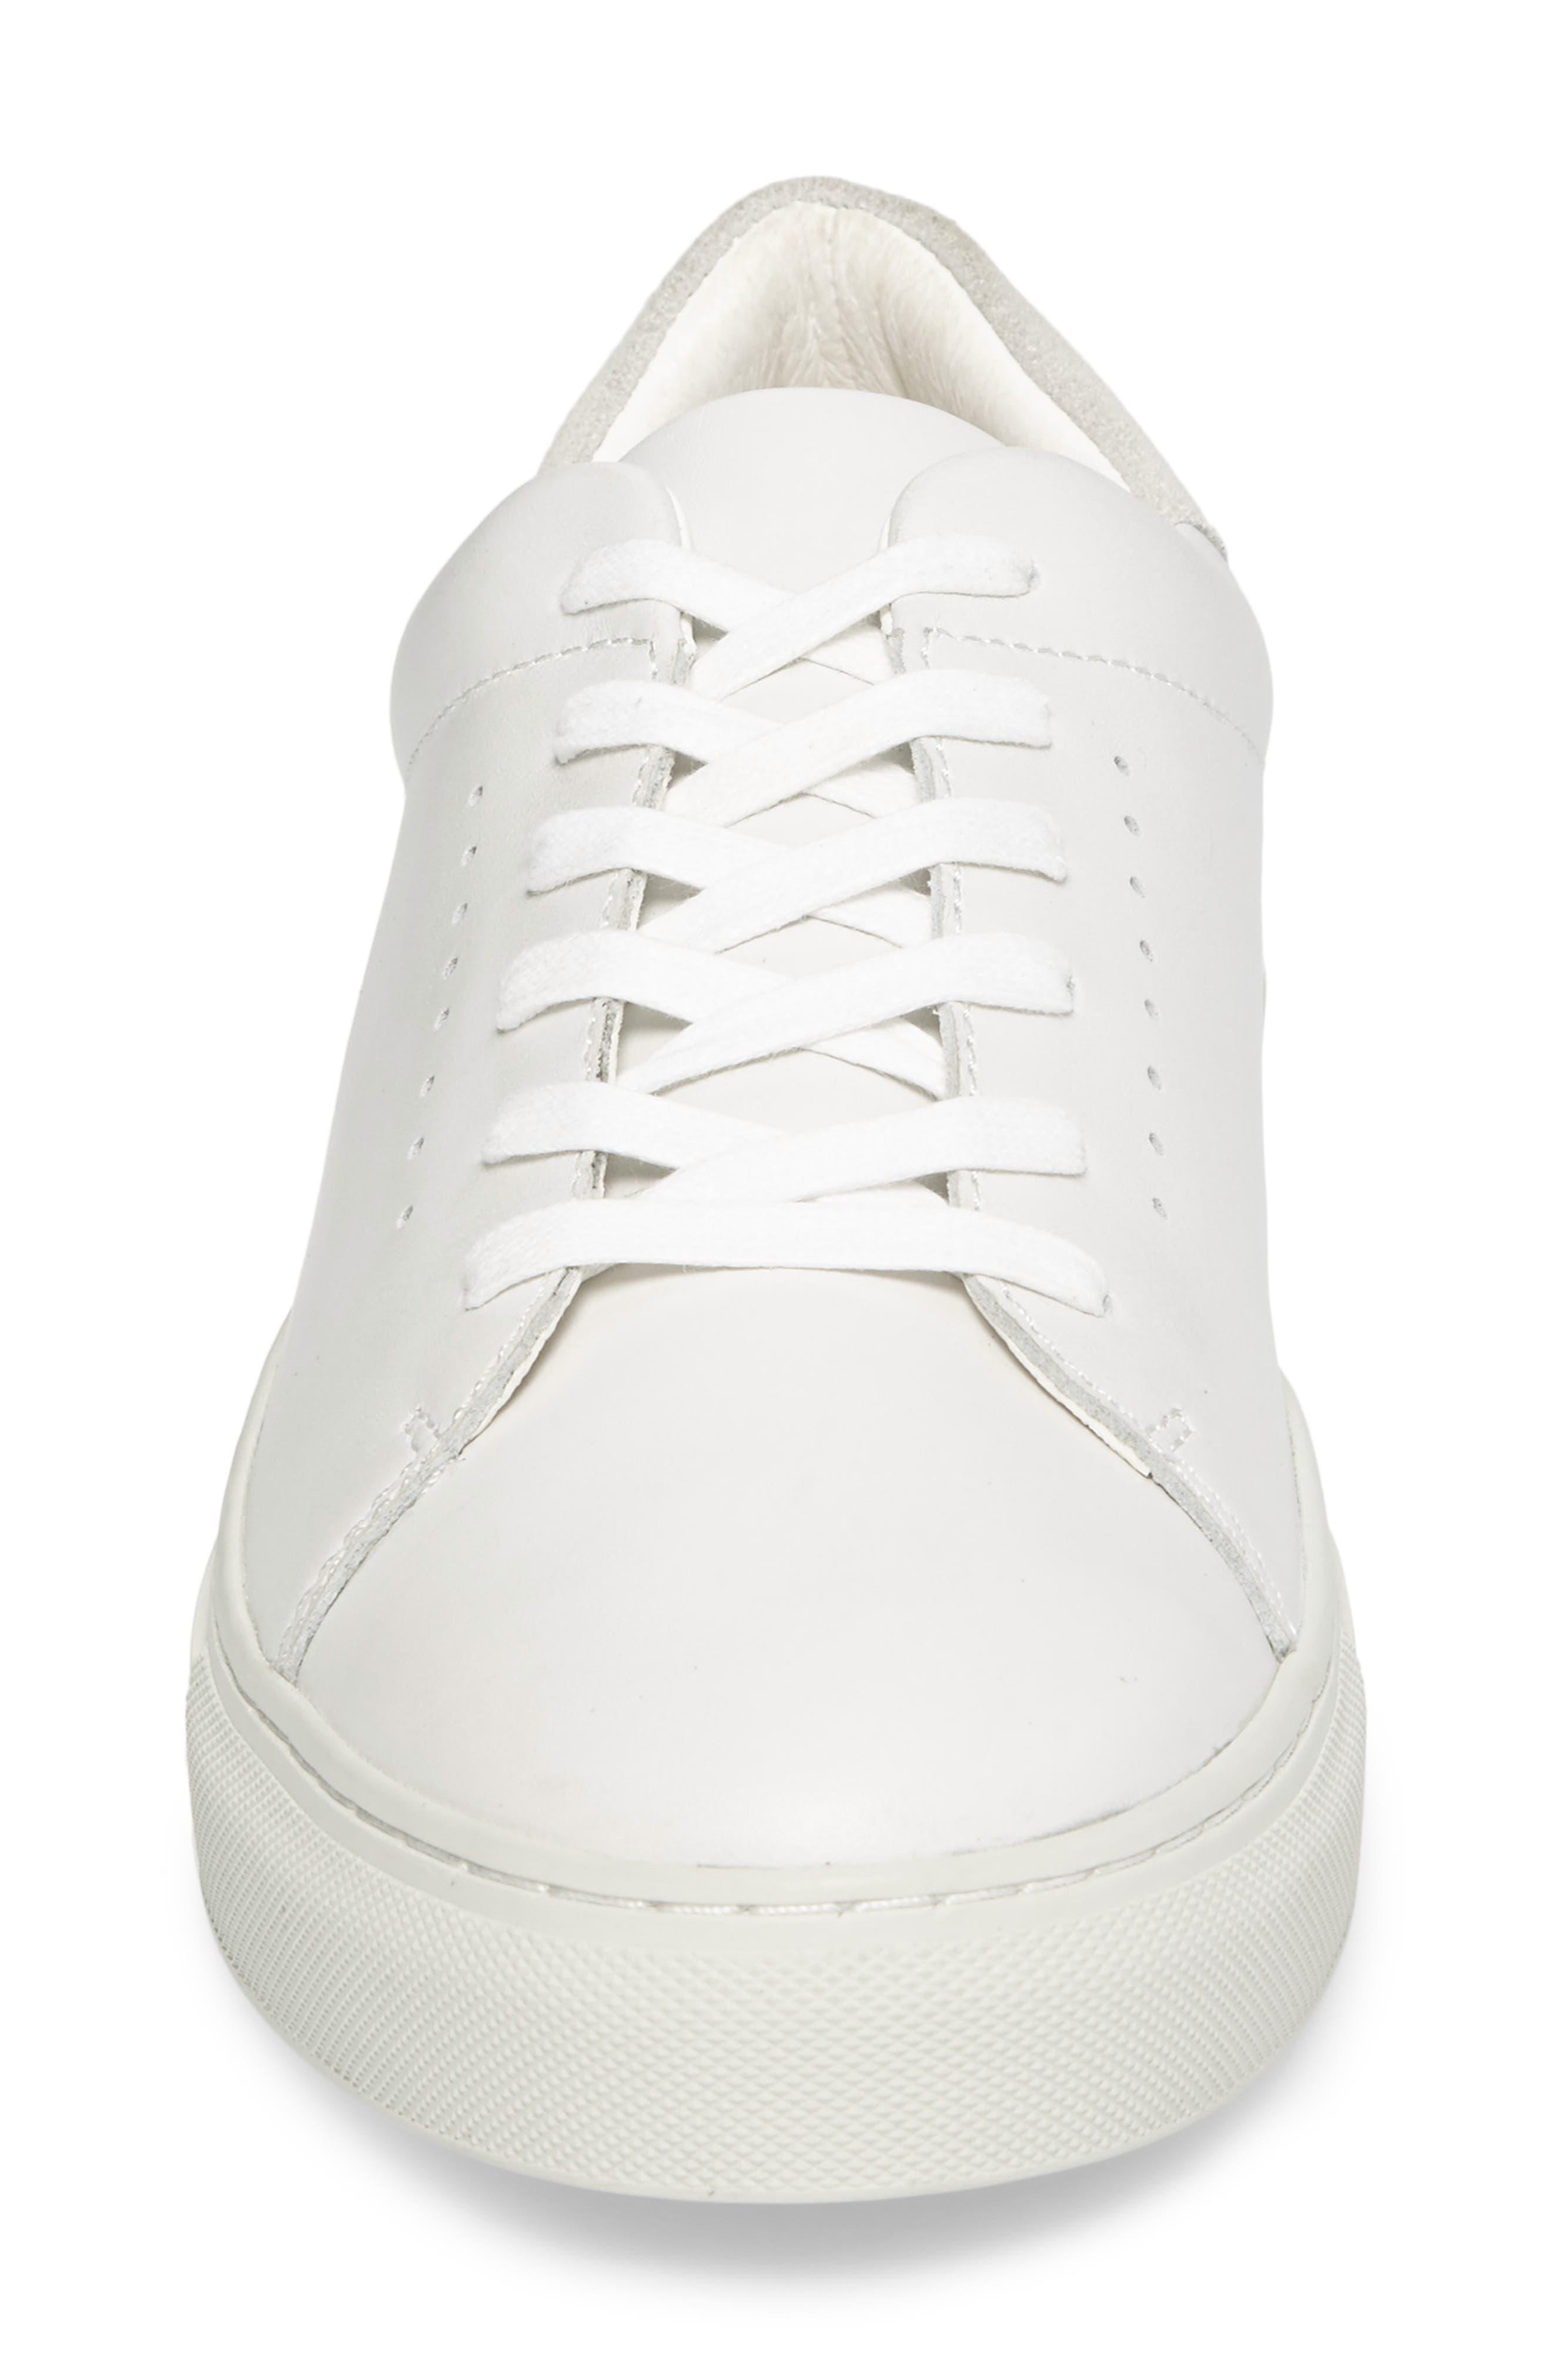 Desmond Sneaker,                             Alternate thumbnail 4, color,                             WHITE LEATHER